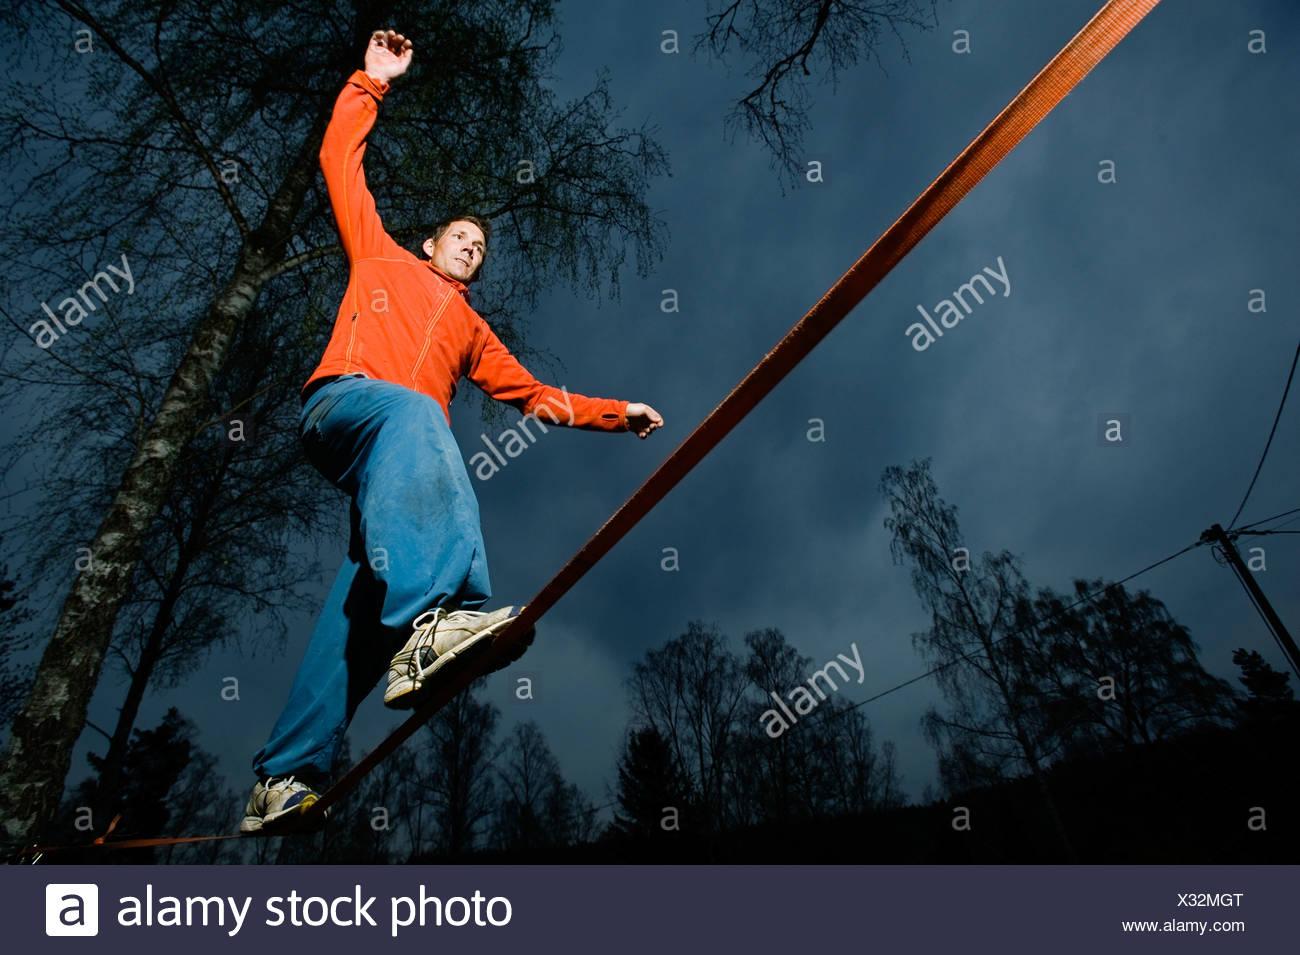 A man balancing on a cord. - Stock Image